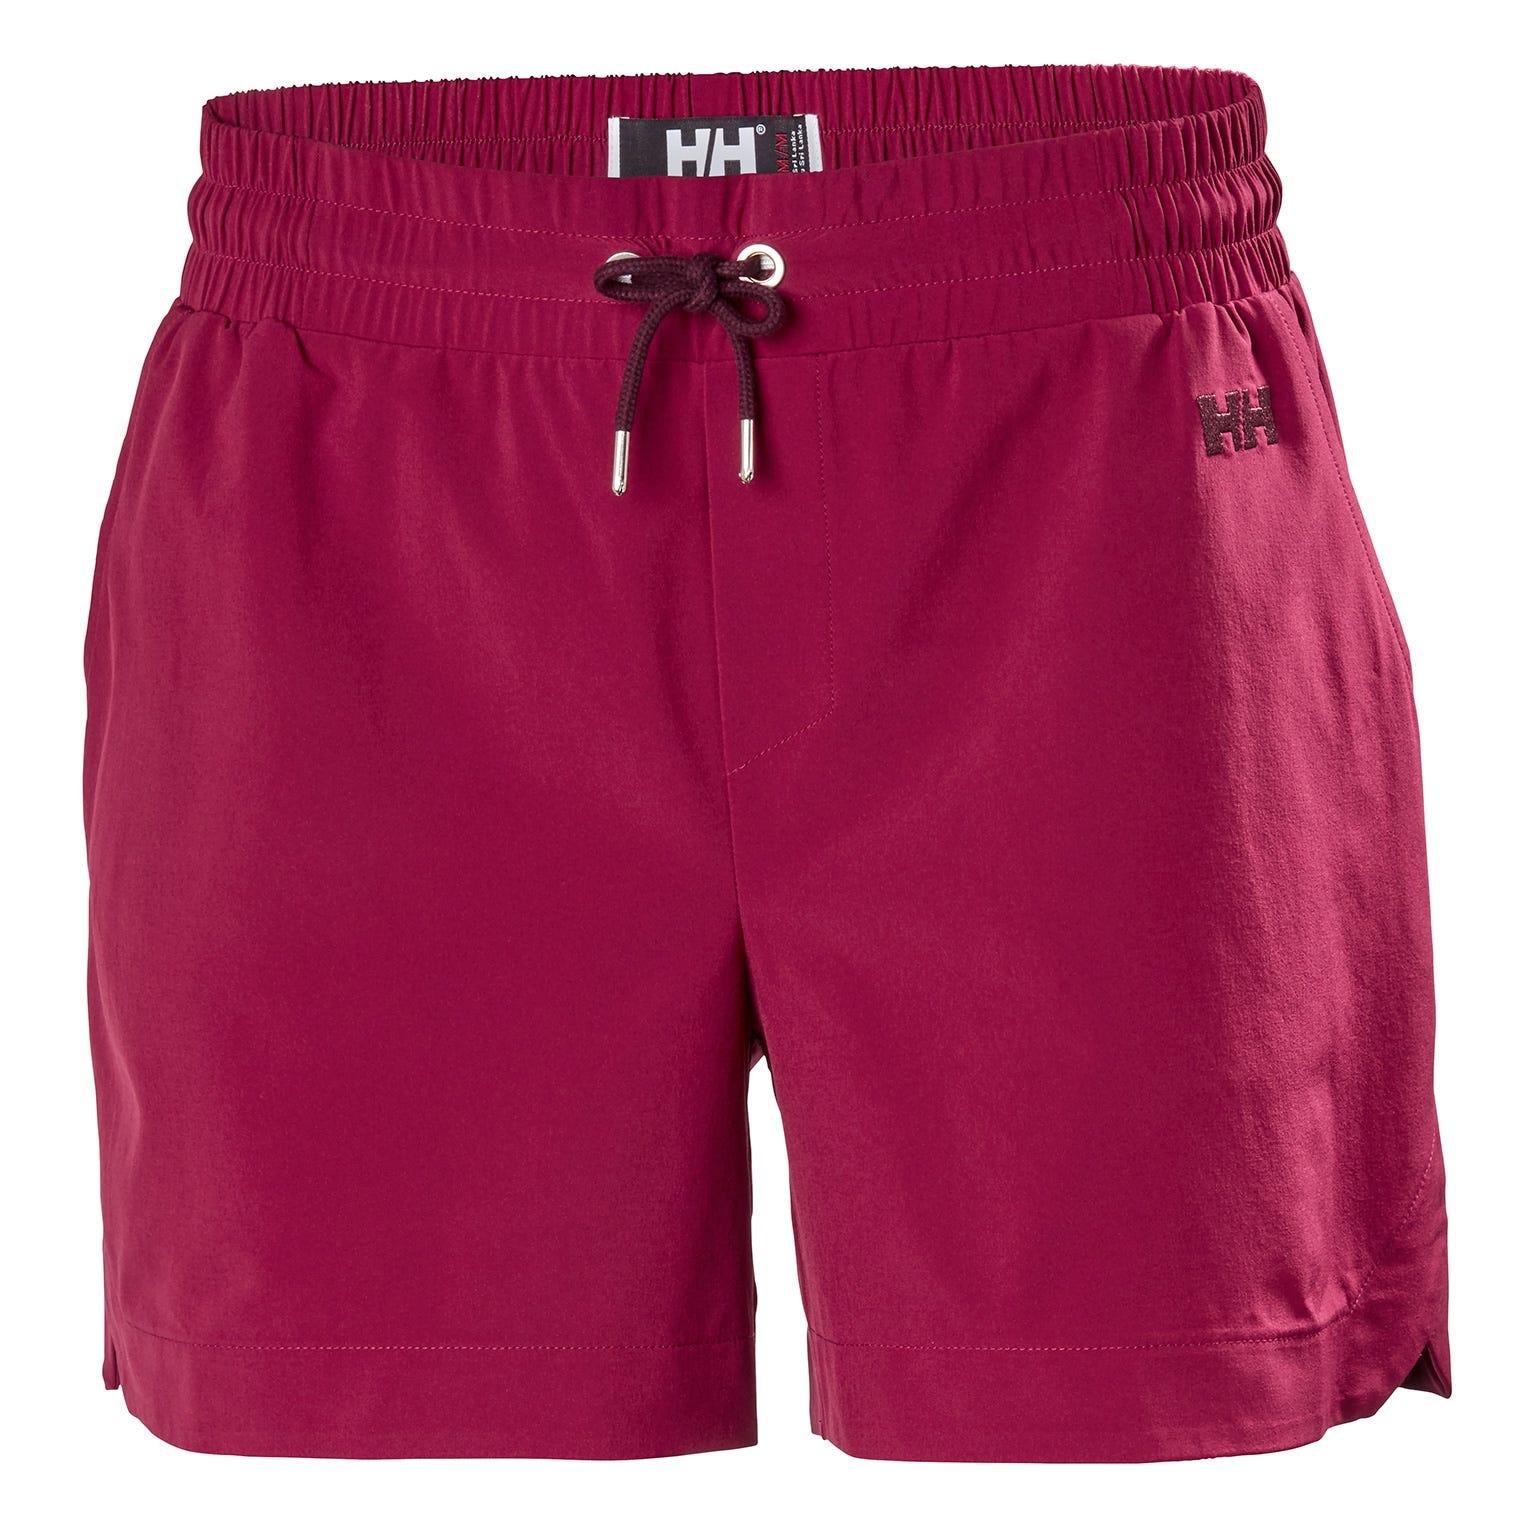 Helly Hansen W Thalia 2 Shorts Womens Sailing Pant Purple S